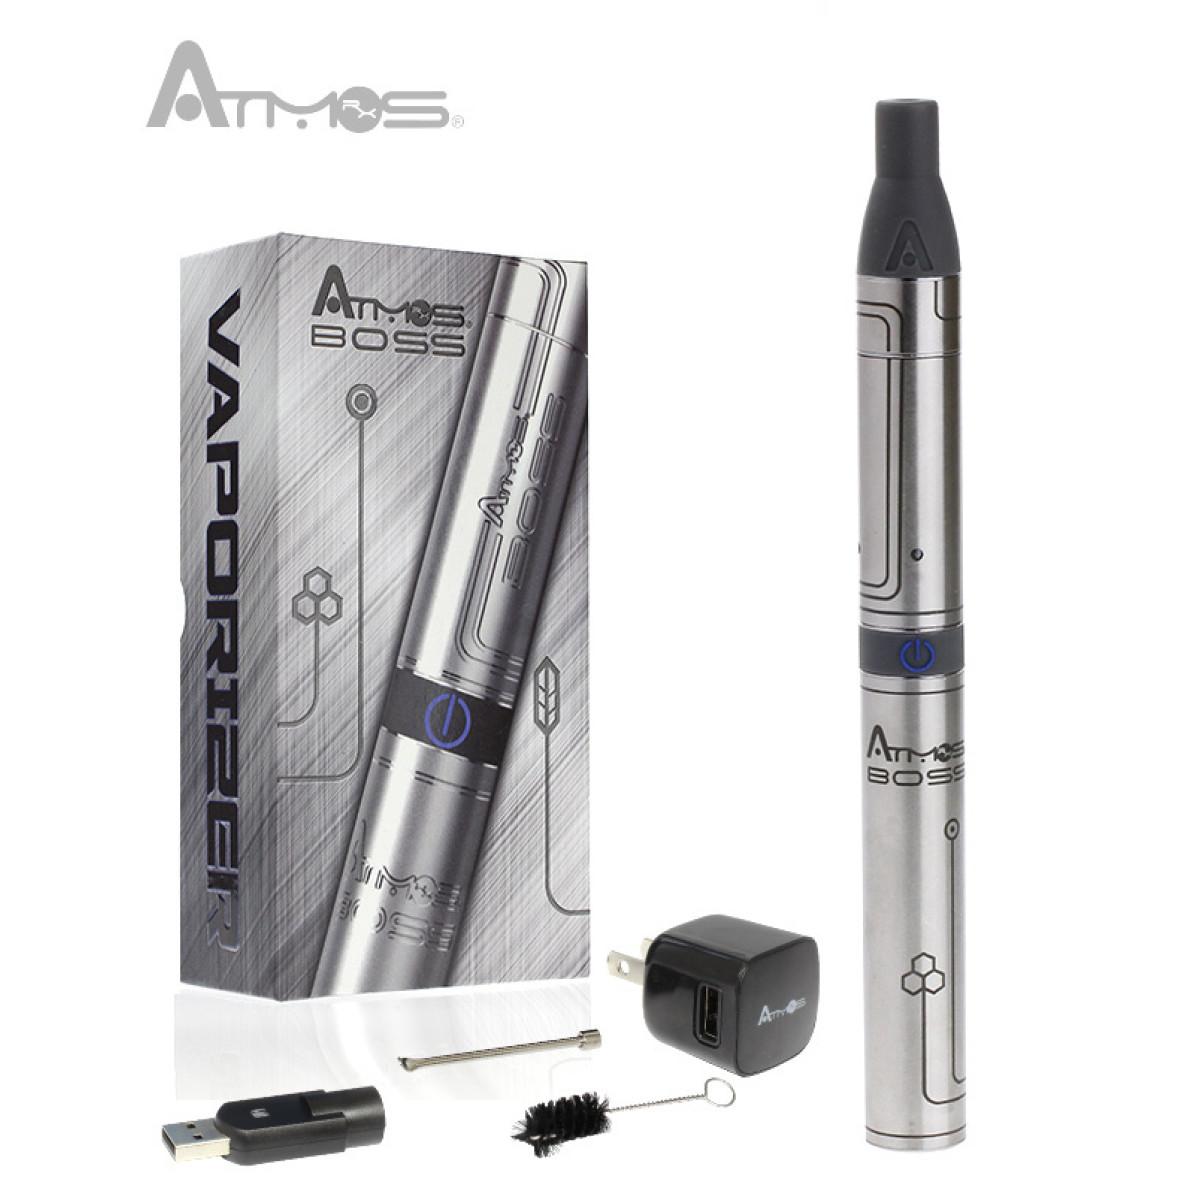 Atmos Boss Kit